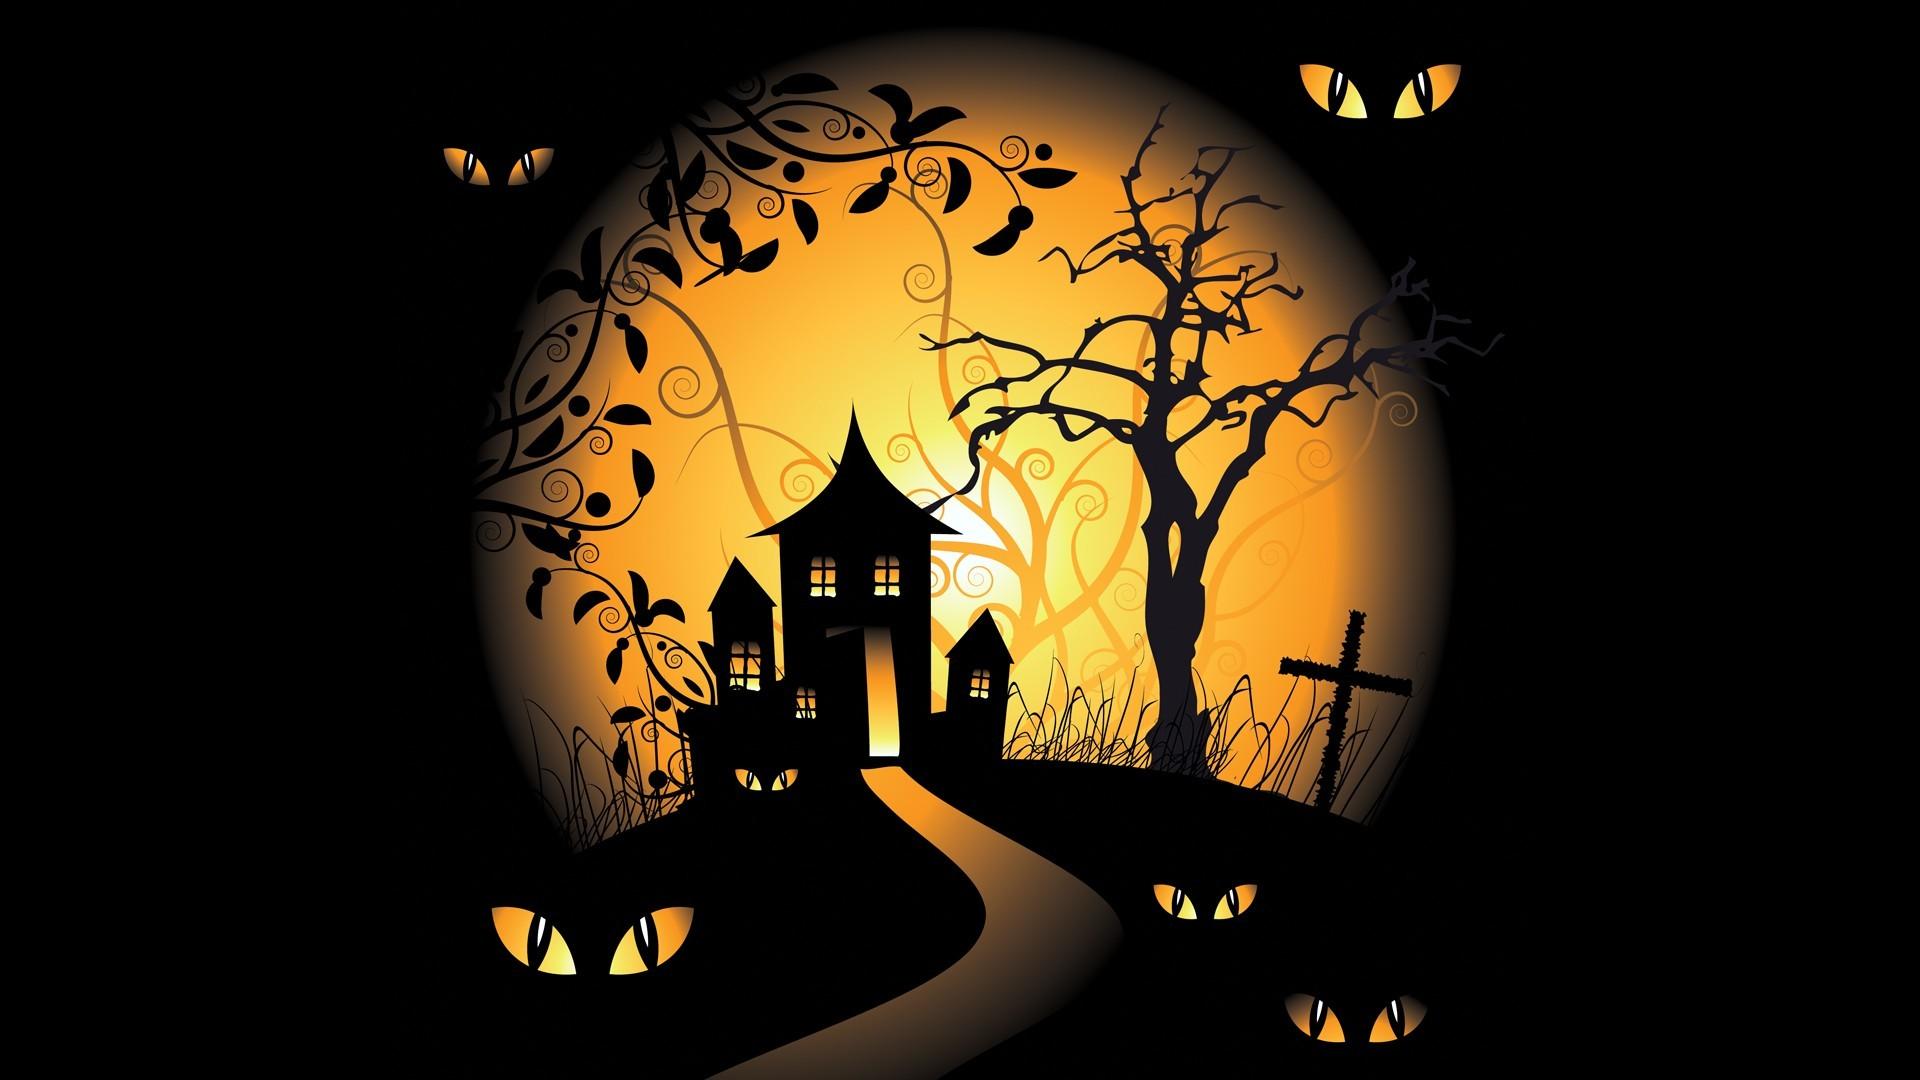 1920x1080 Halloween Spooky Digital Art Bats Black Background Vector